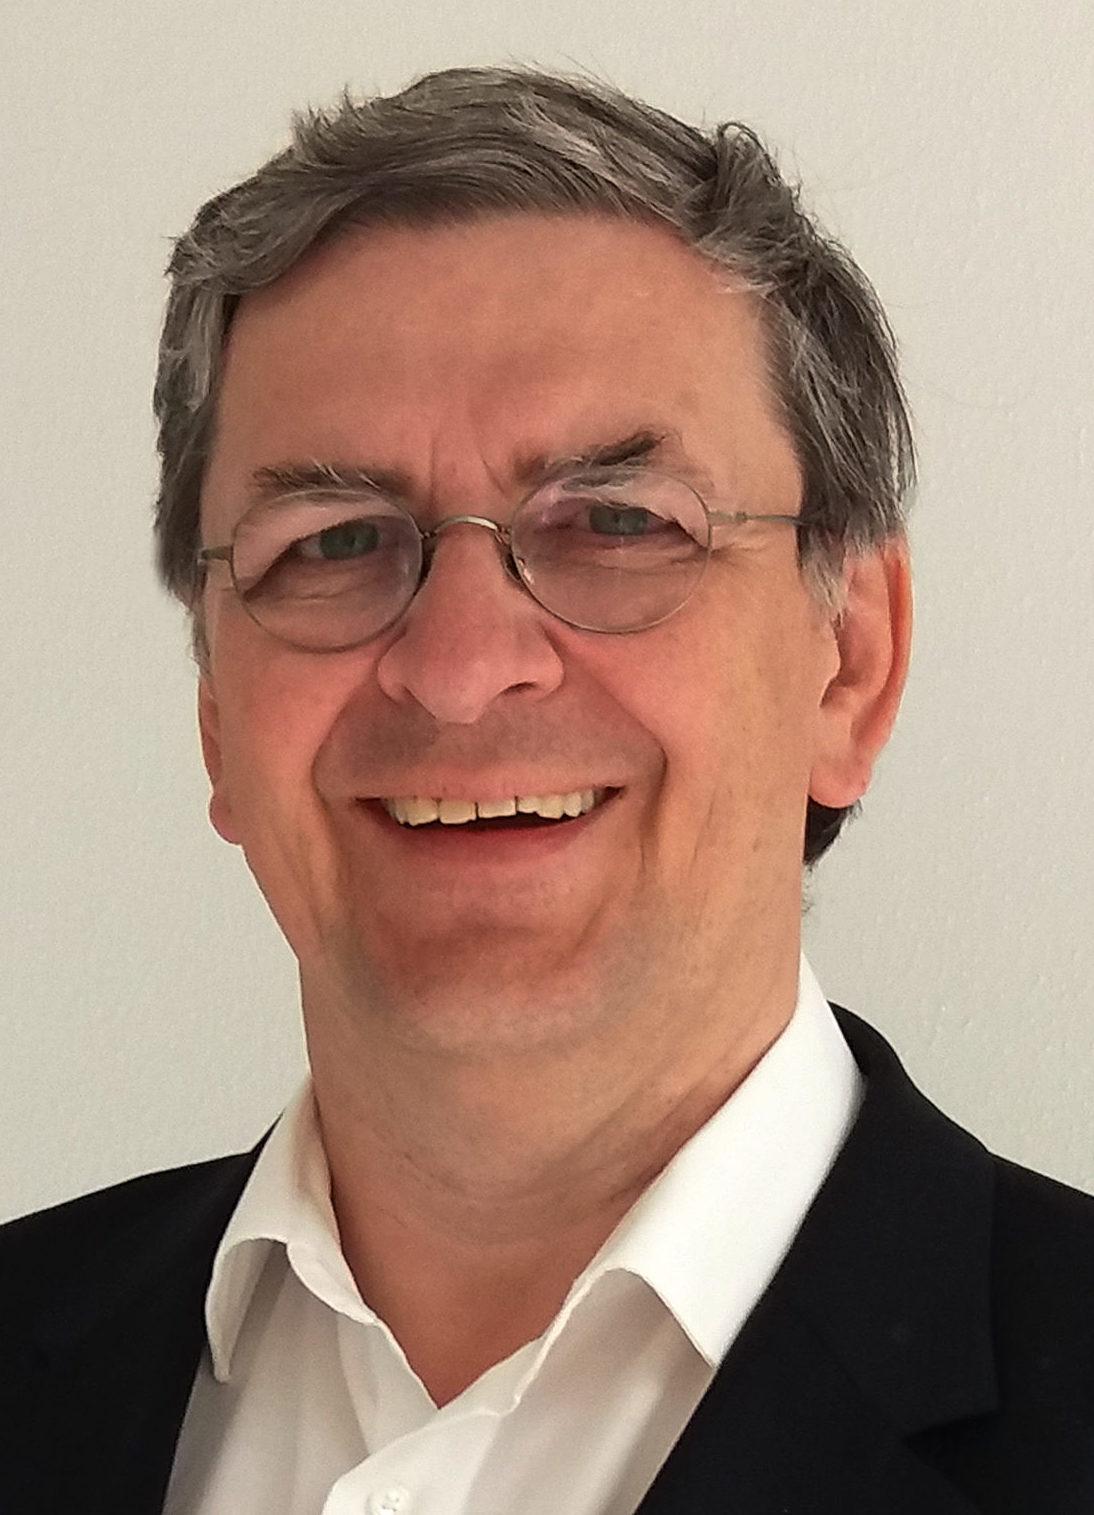 Karl-Ludwig Schinner | opdi-tex CEO